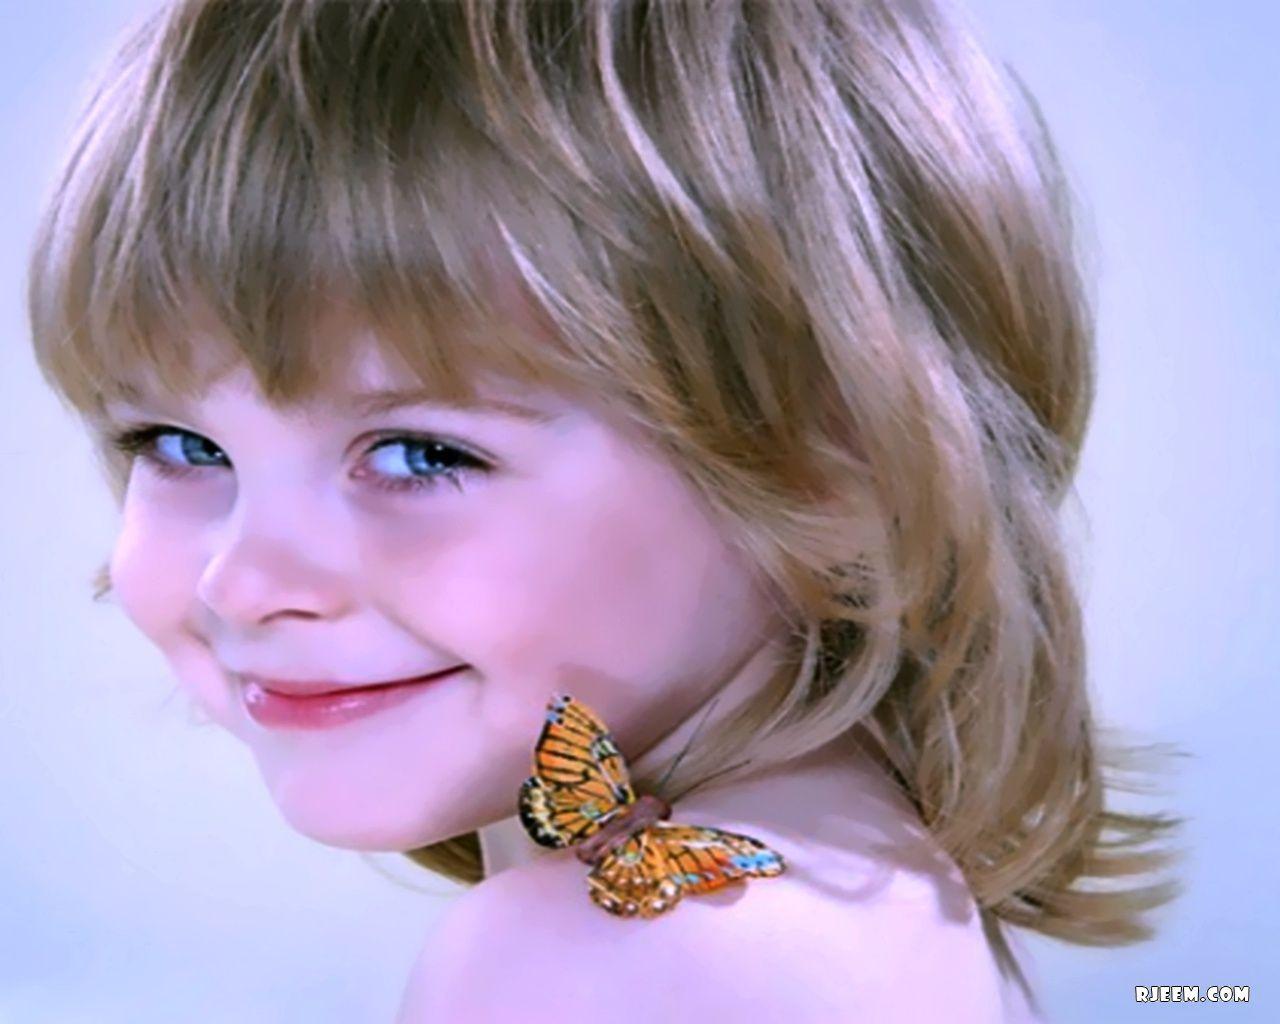 صور اطفال تبتسم جميلة بنات واولاد صغار Baby Pictures Fashion Earrings